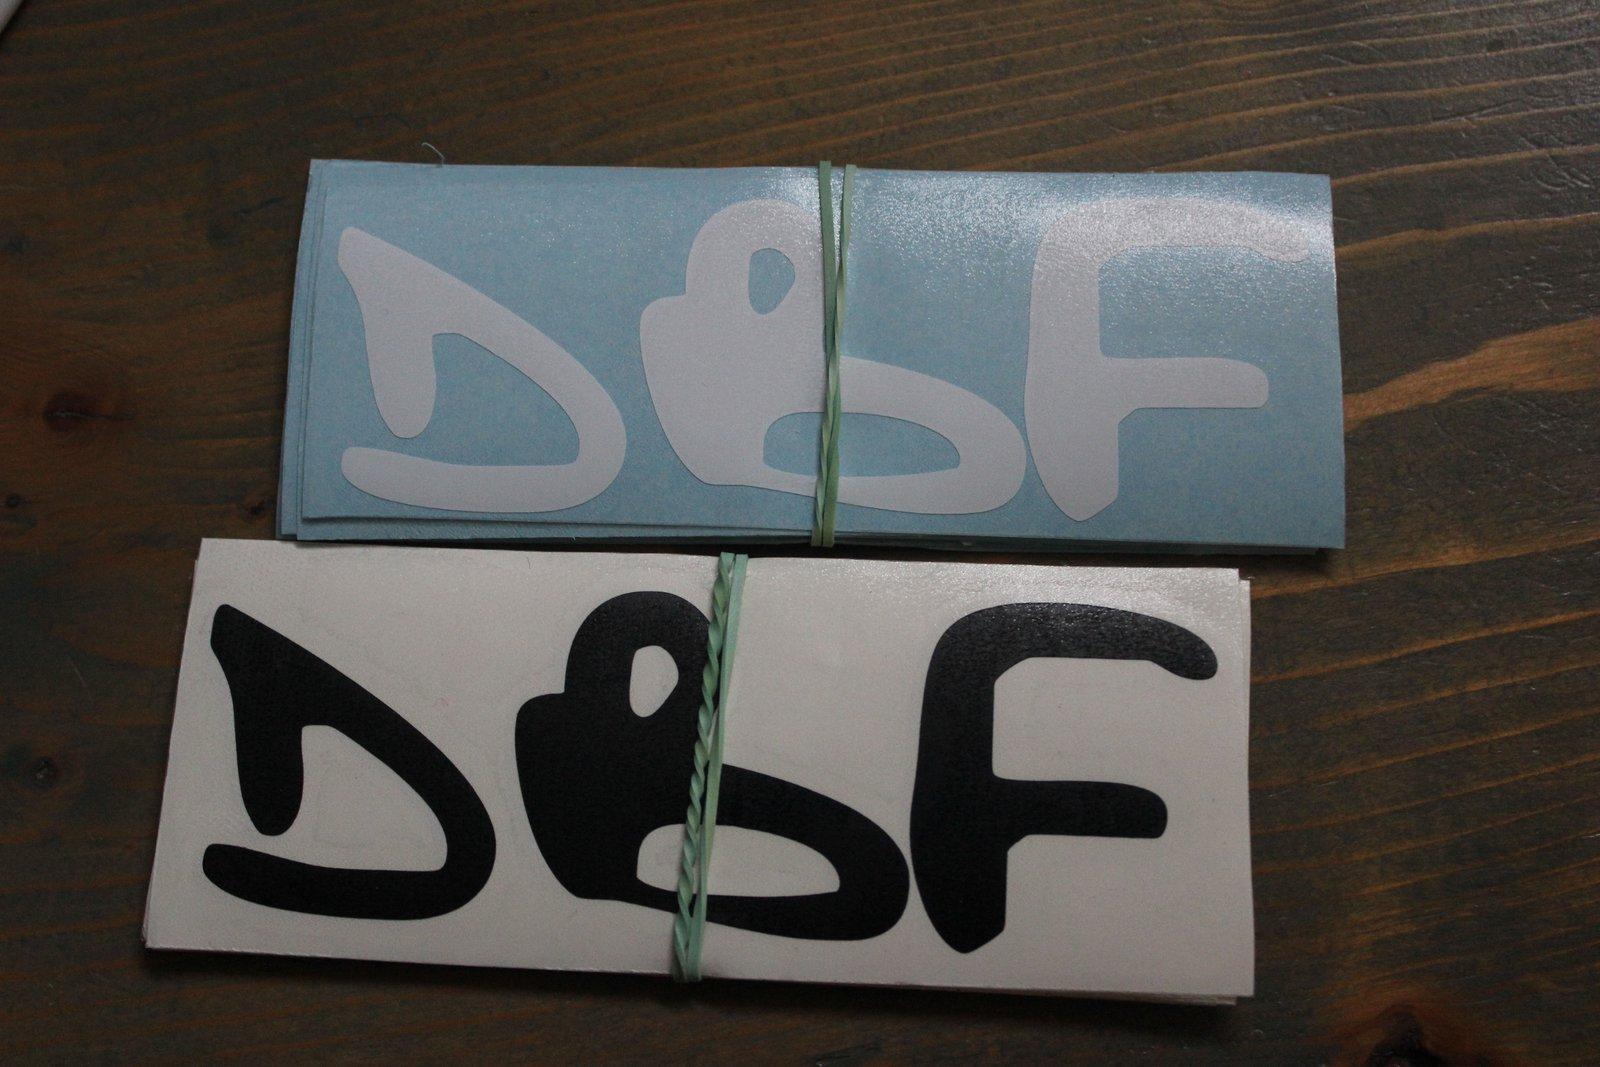 DBF Stickers